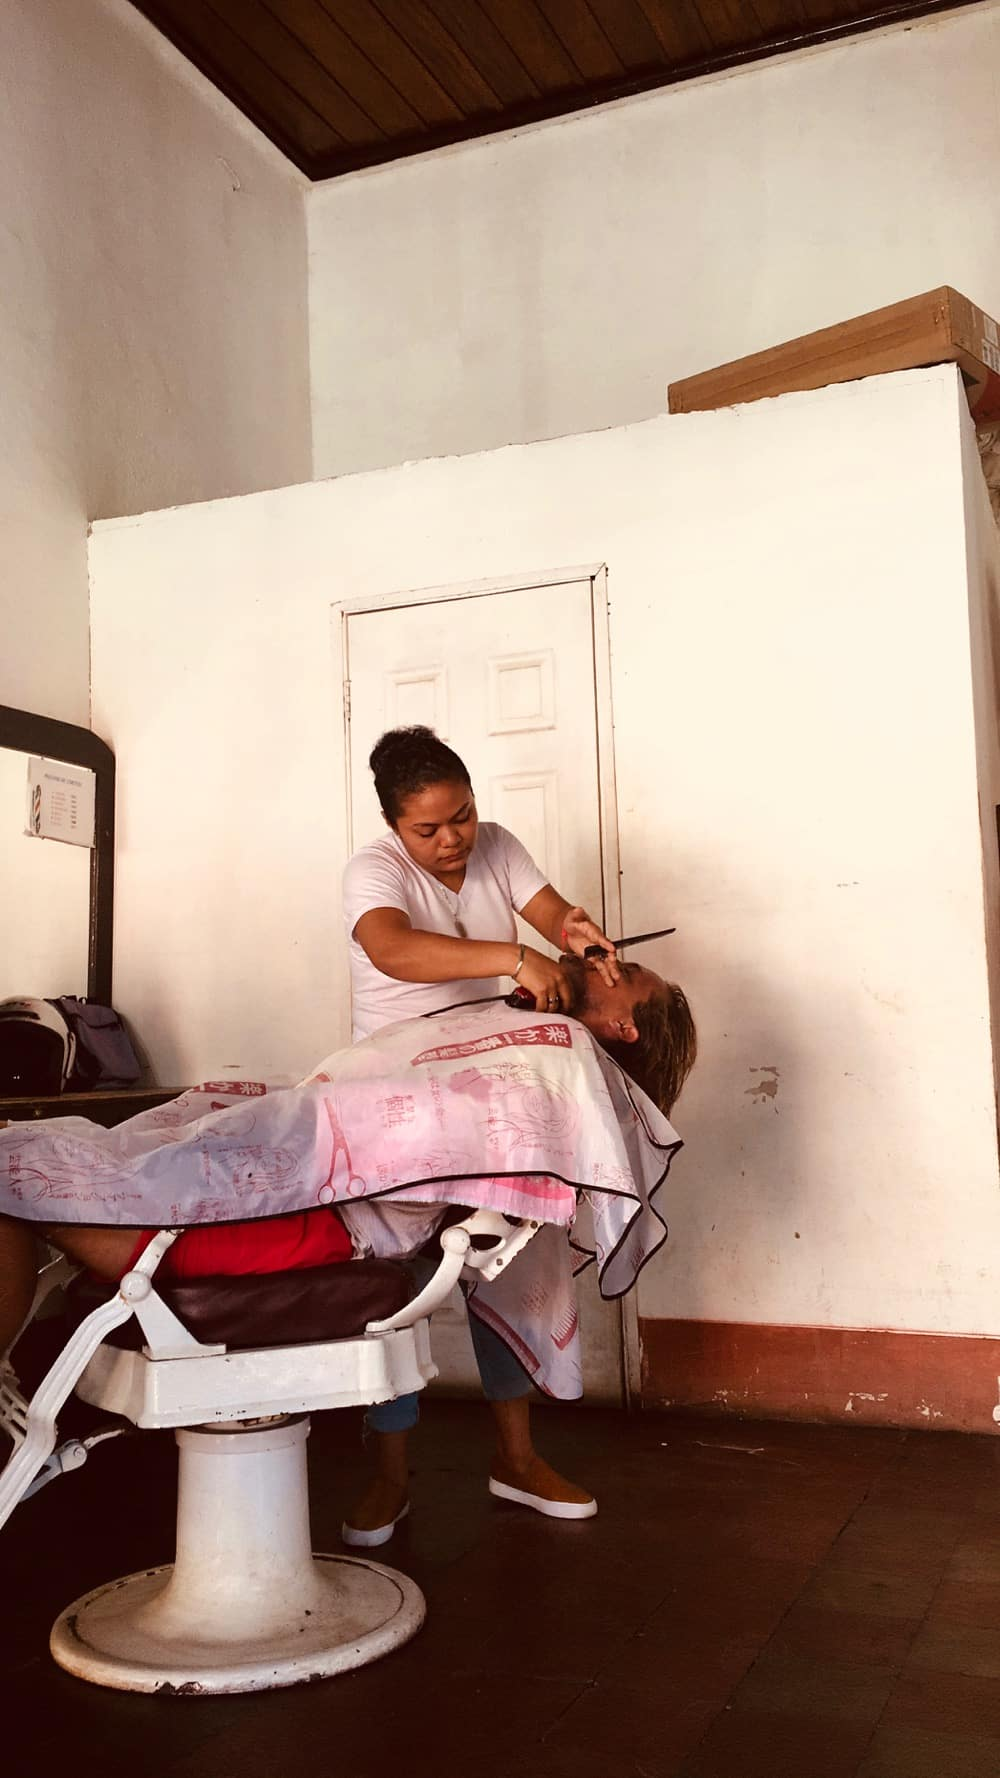 barbier Chinendega - chipiron surf trip